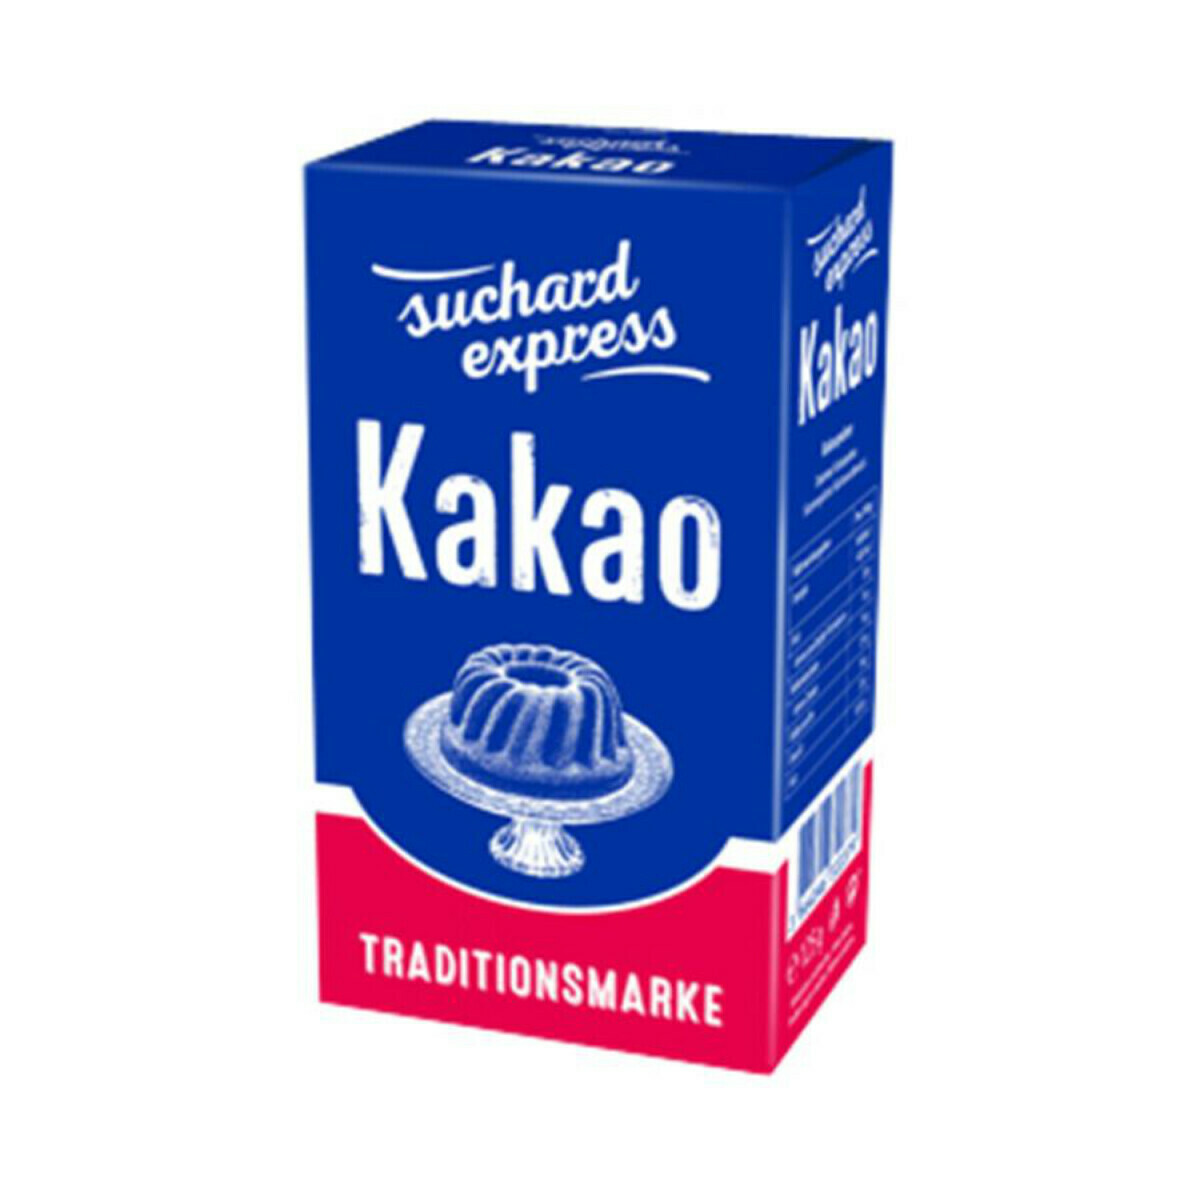 Grosspackung Suchard Express Kakao 20 x 125 g = 2,5 kg